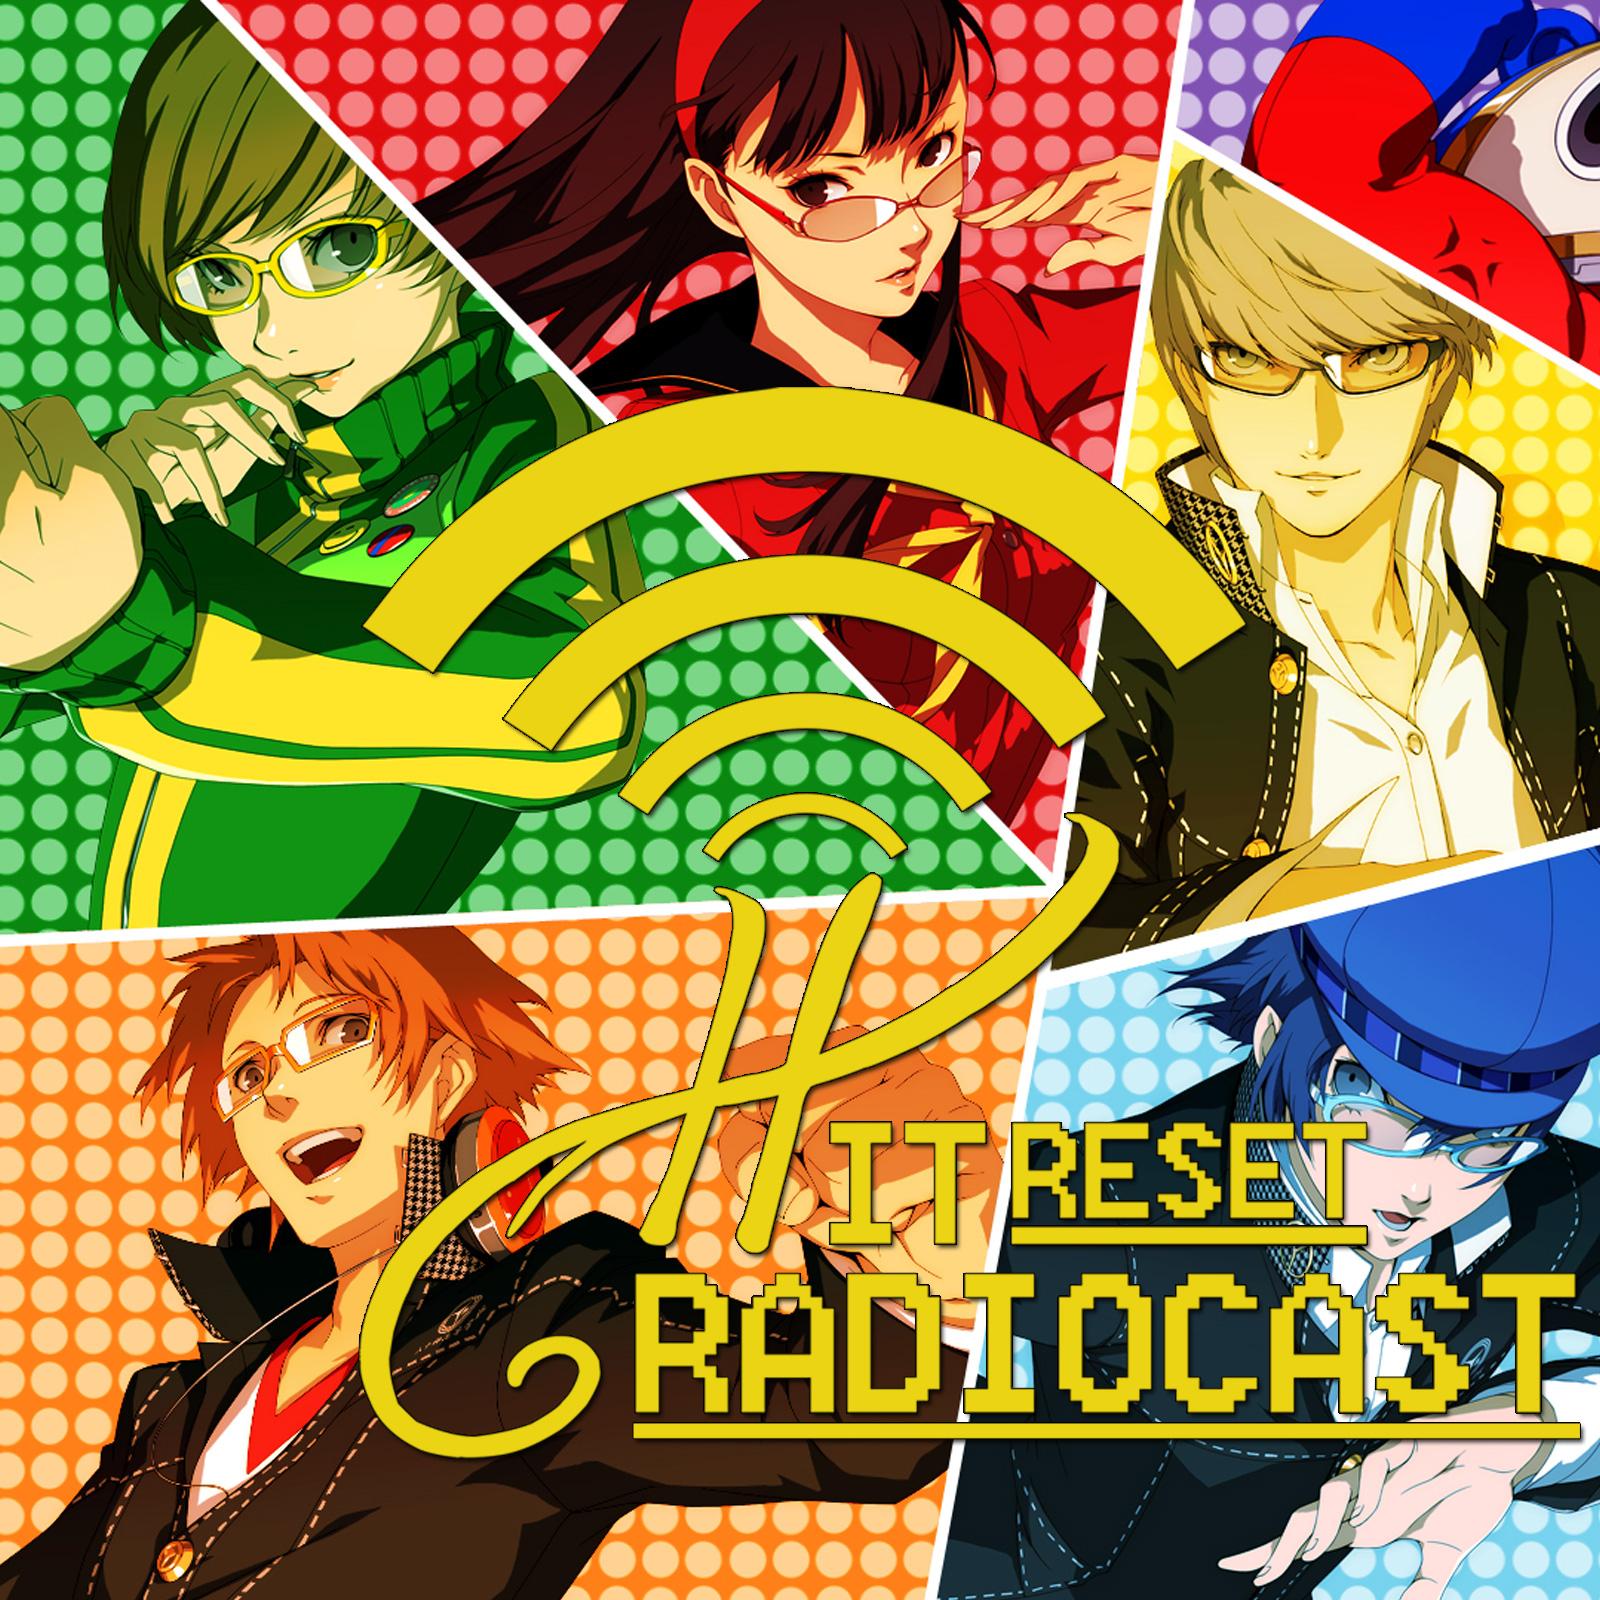 Hit Reset Radiocast